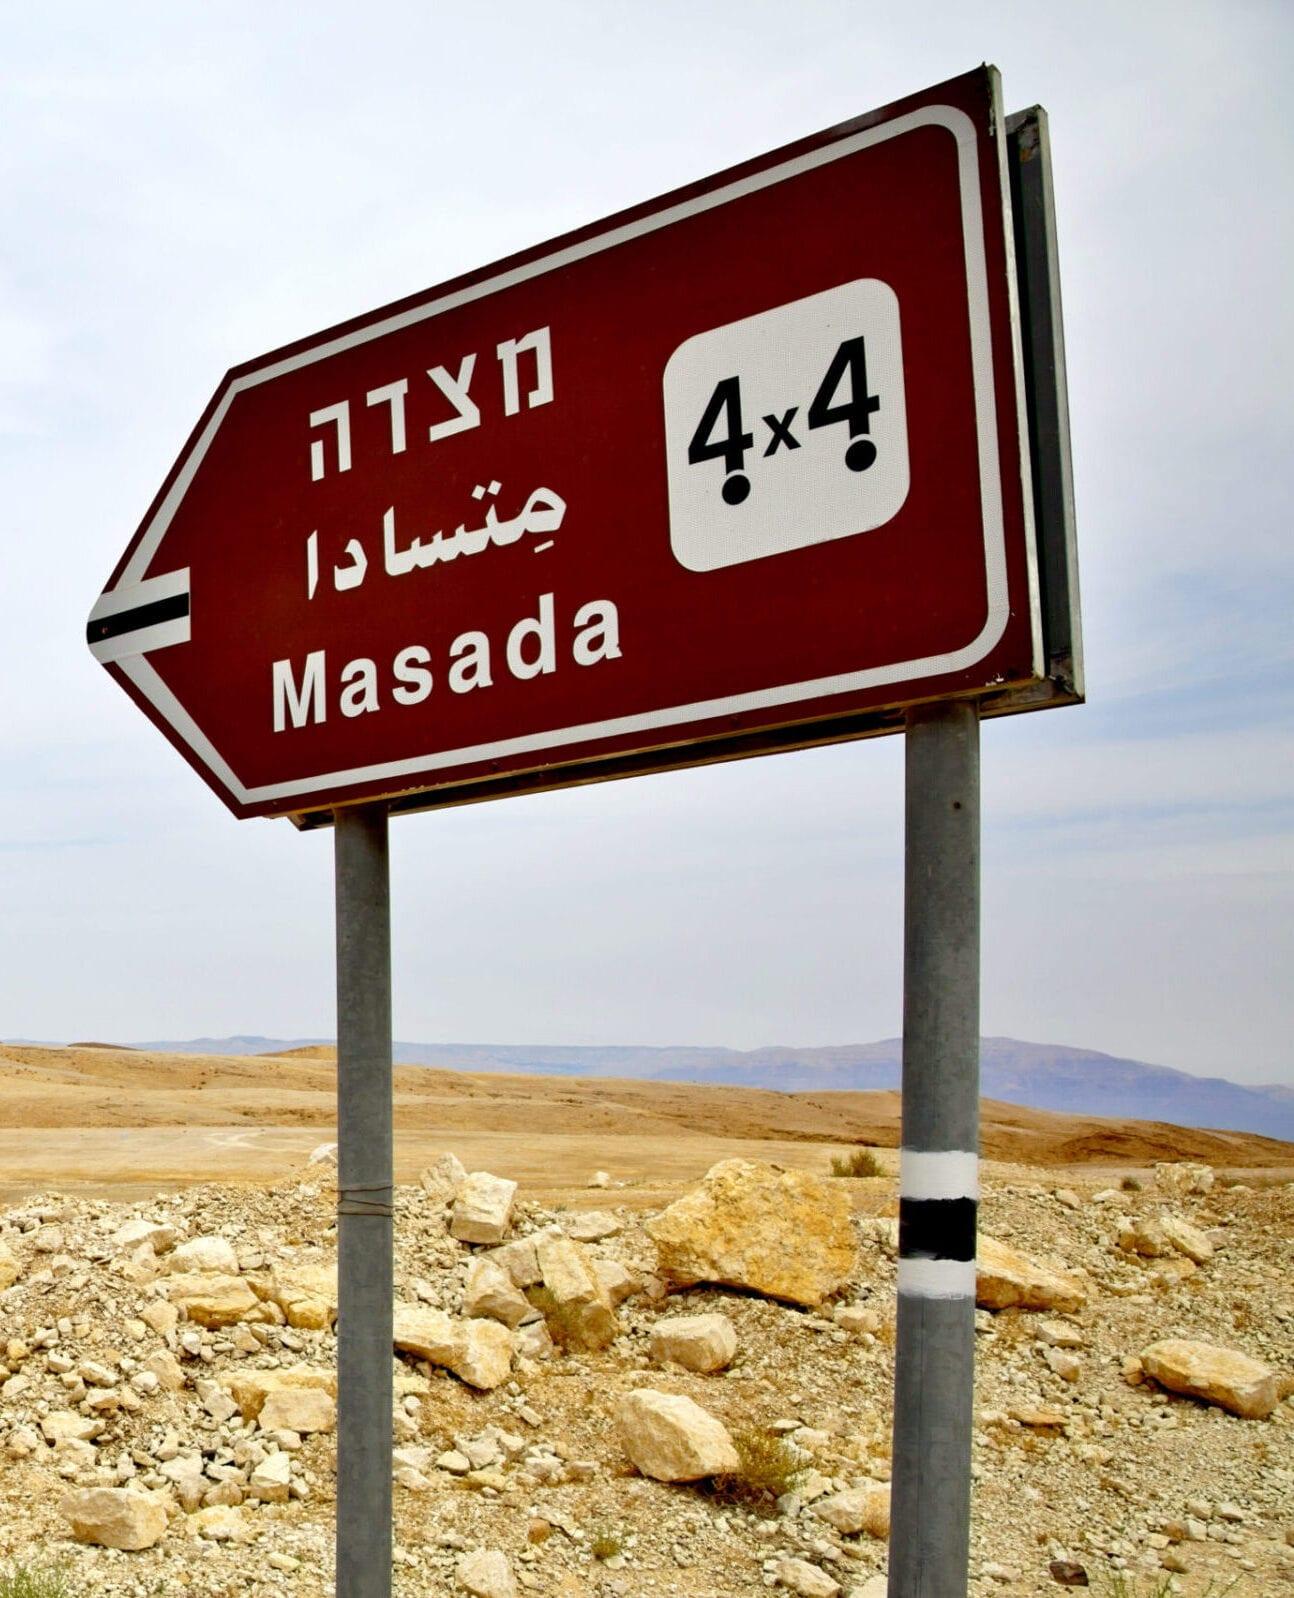 Masada Ultimate Guide - 4X4 Jeeping